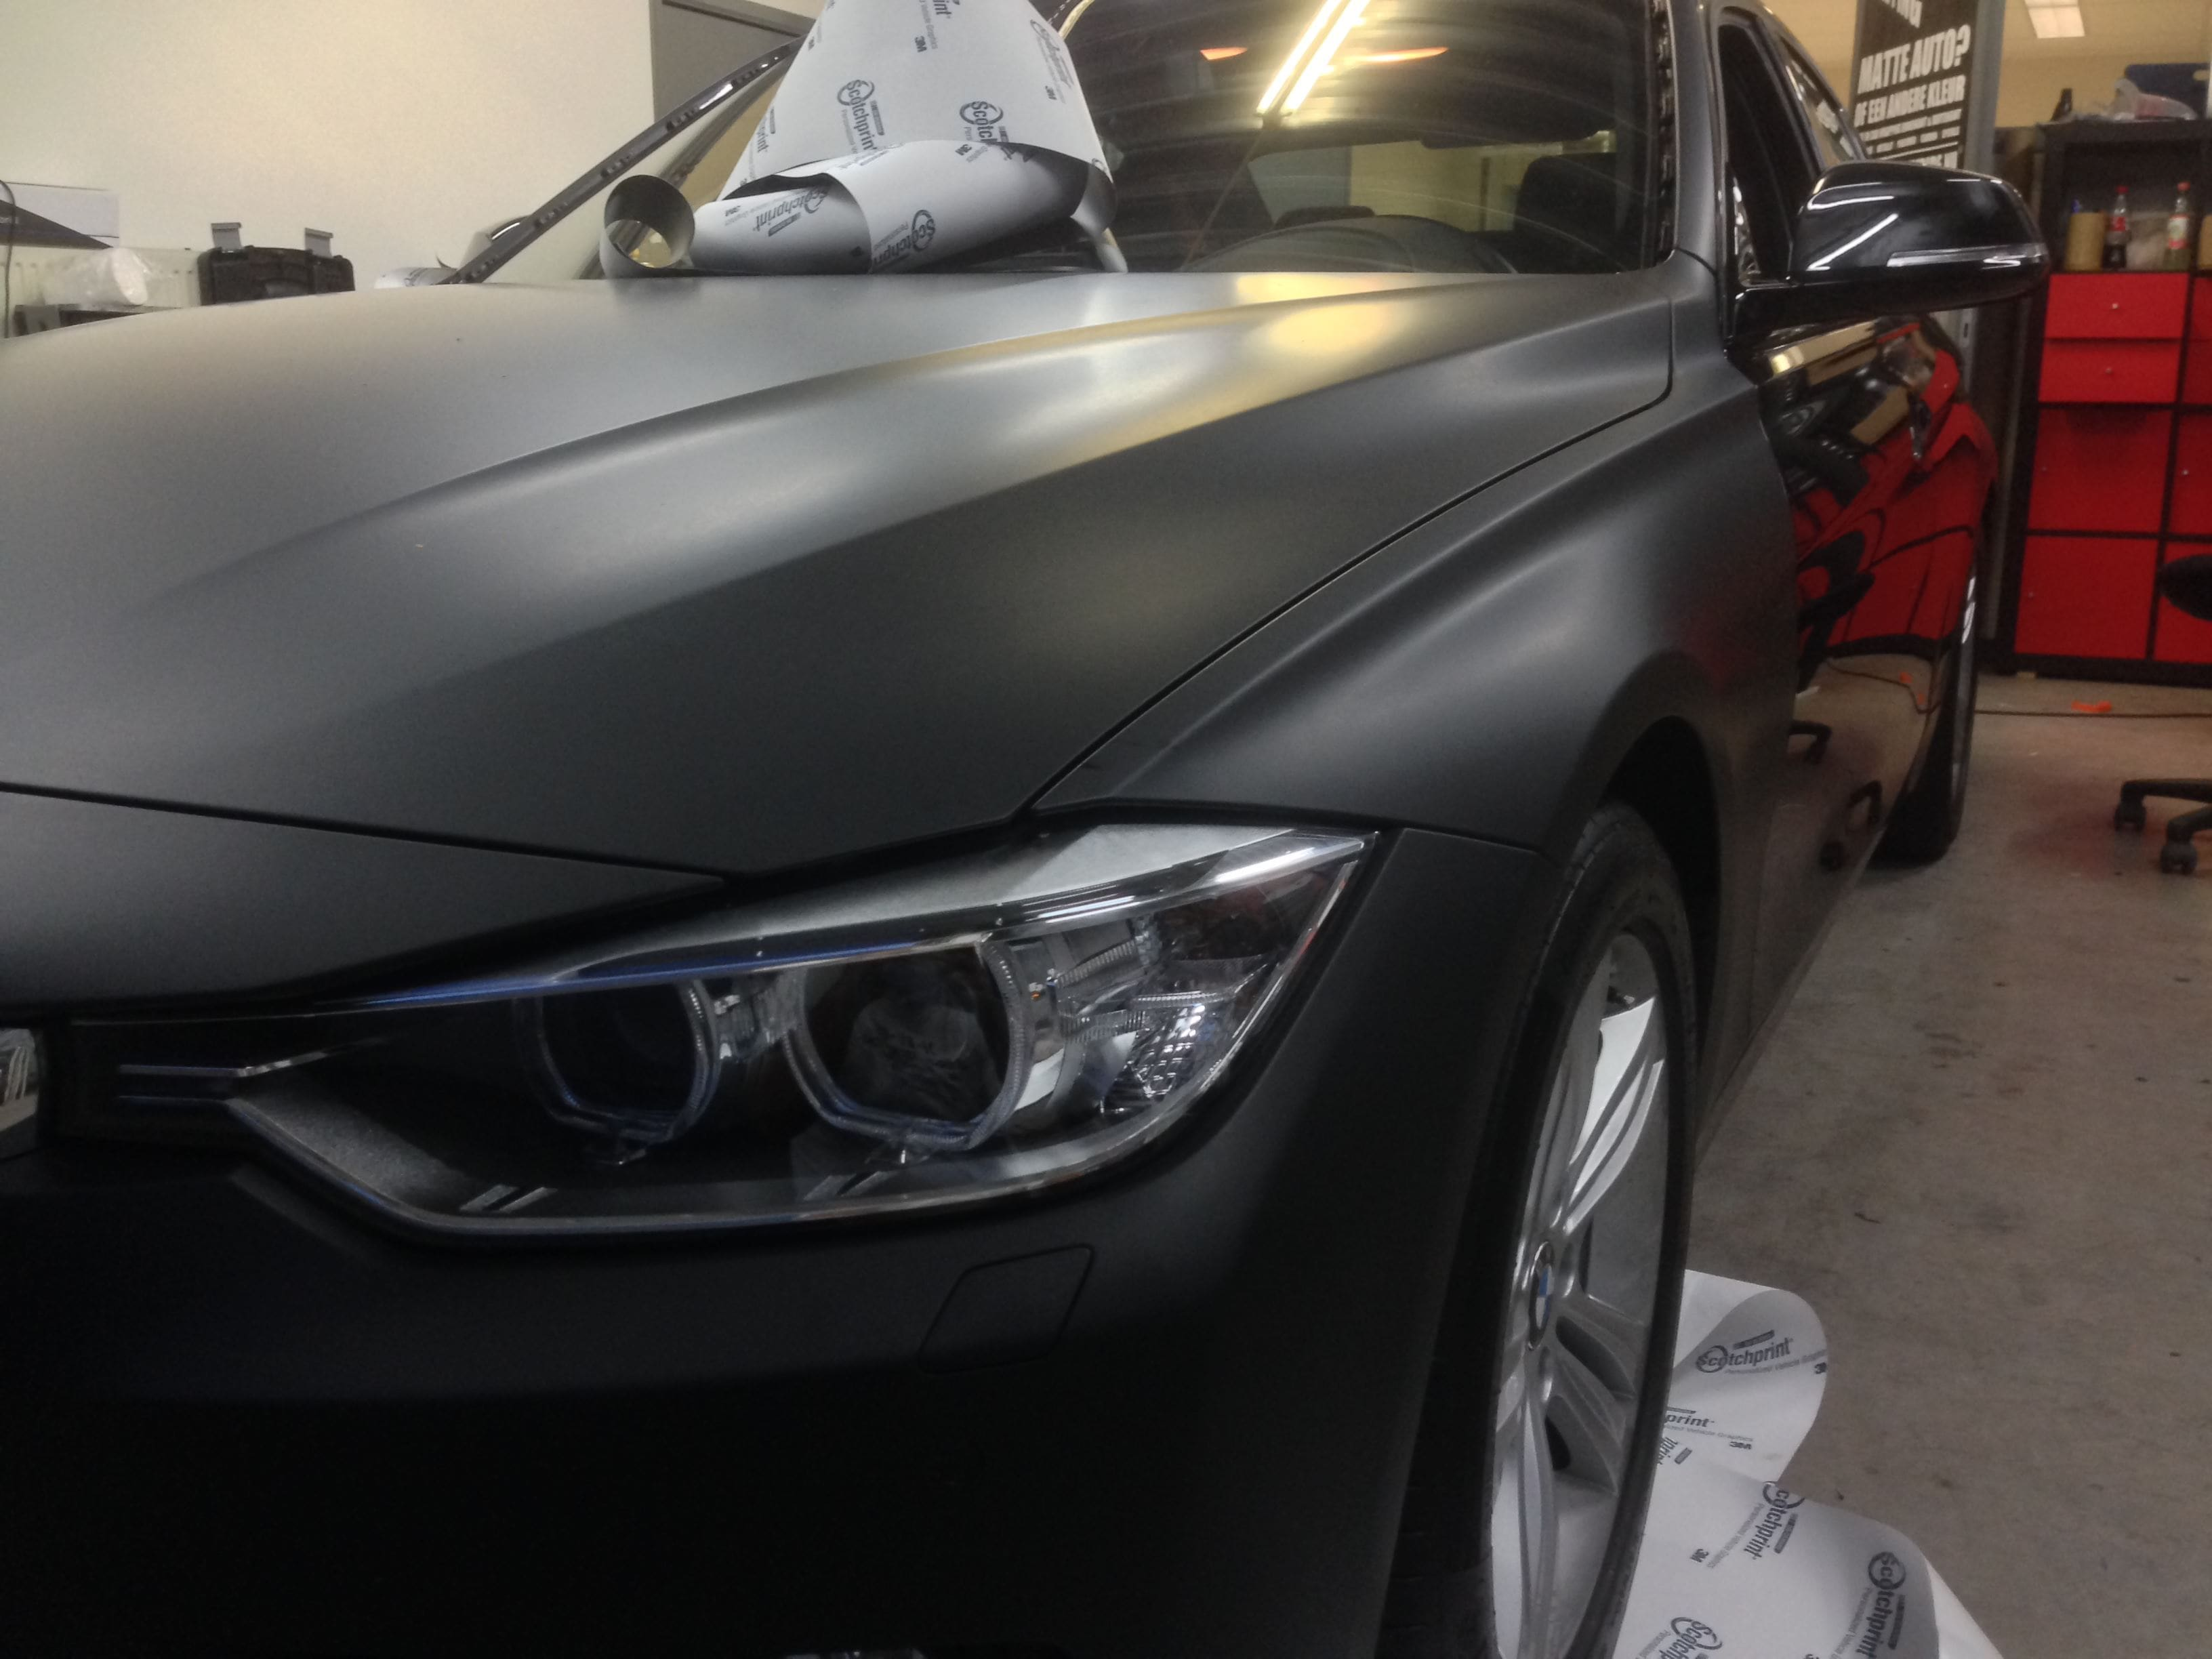 BMW E92 3 Serie met Mat Zwarte Wrap, Carwrapping door Wrapmyride.nu Foto-nr:5404, ©2020